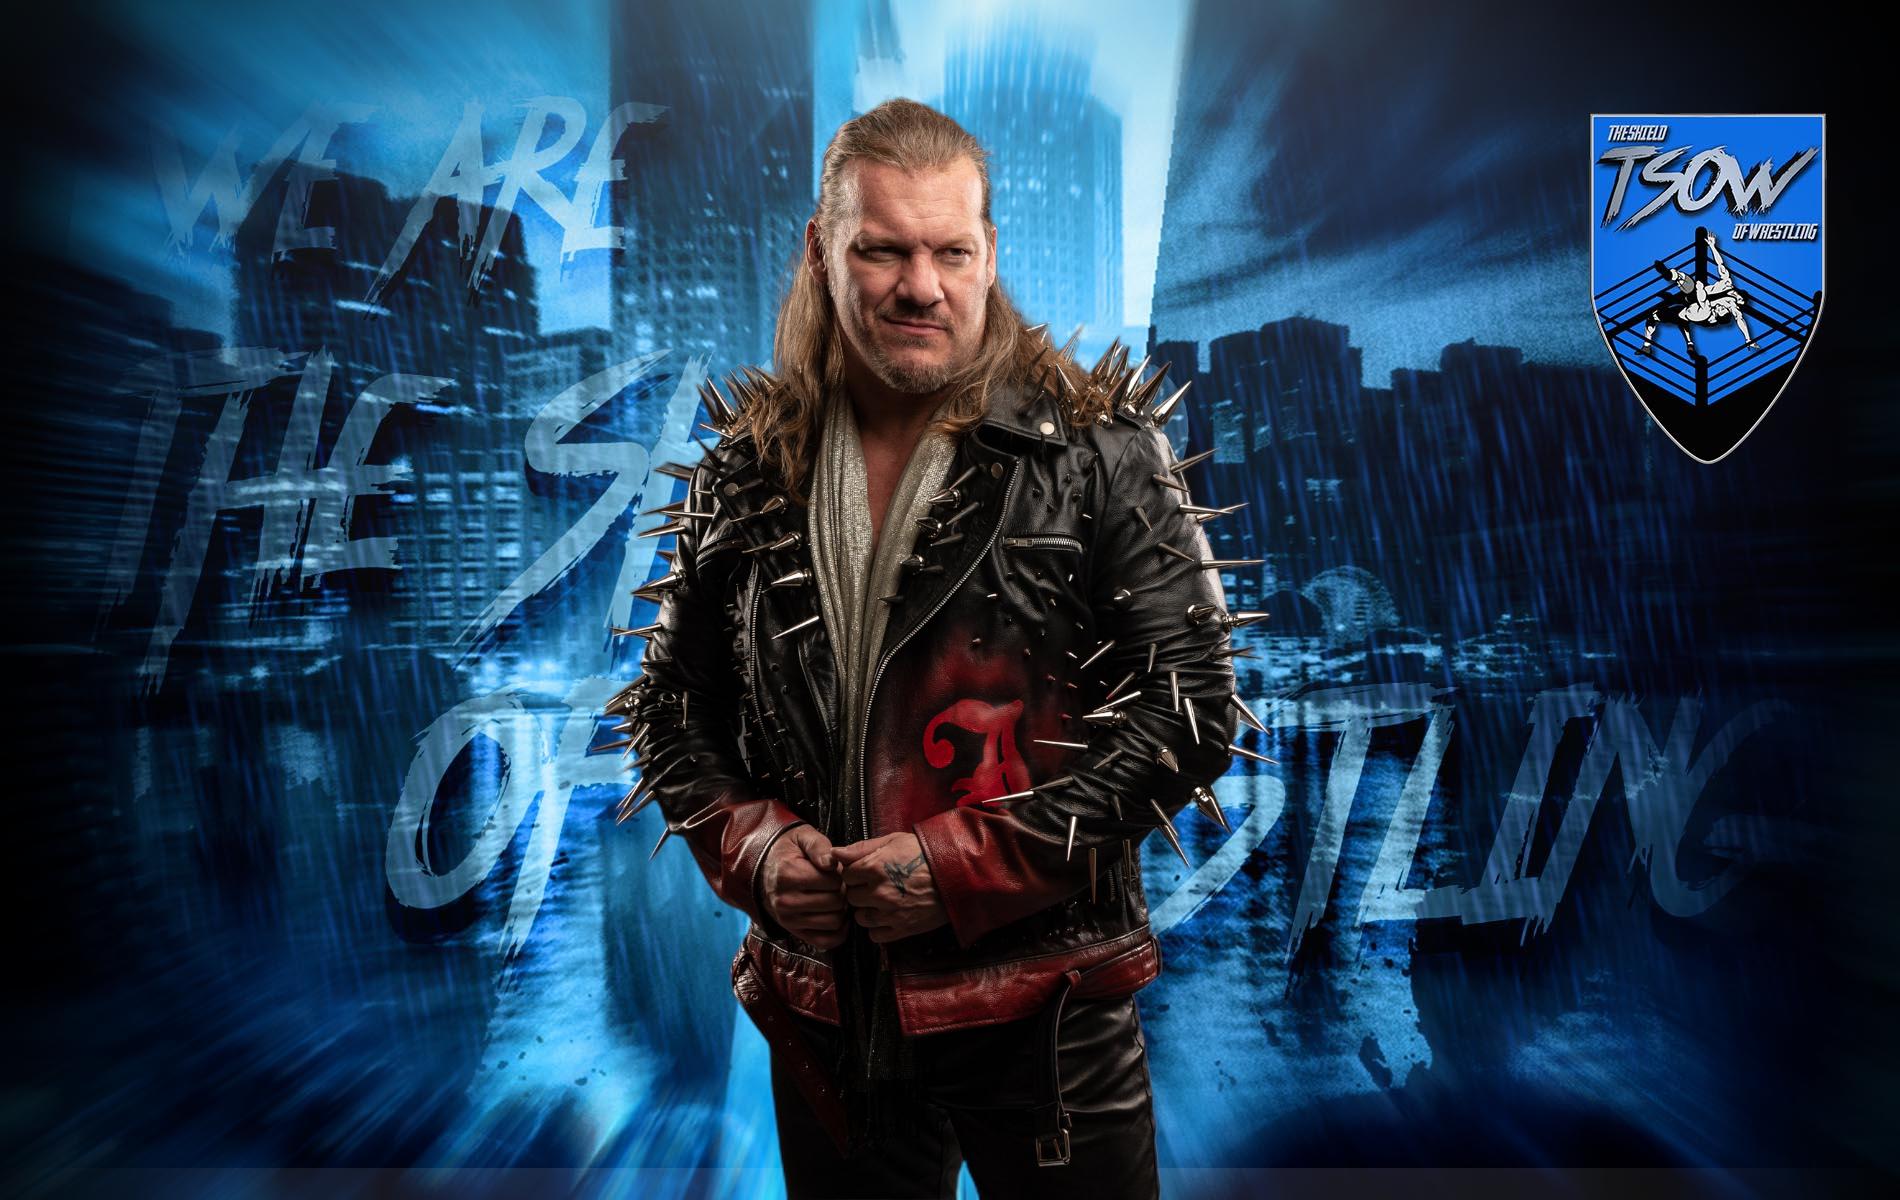 Chris Jericho ospite a Broken Skull Sessions di Steve Austin